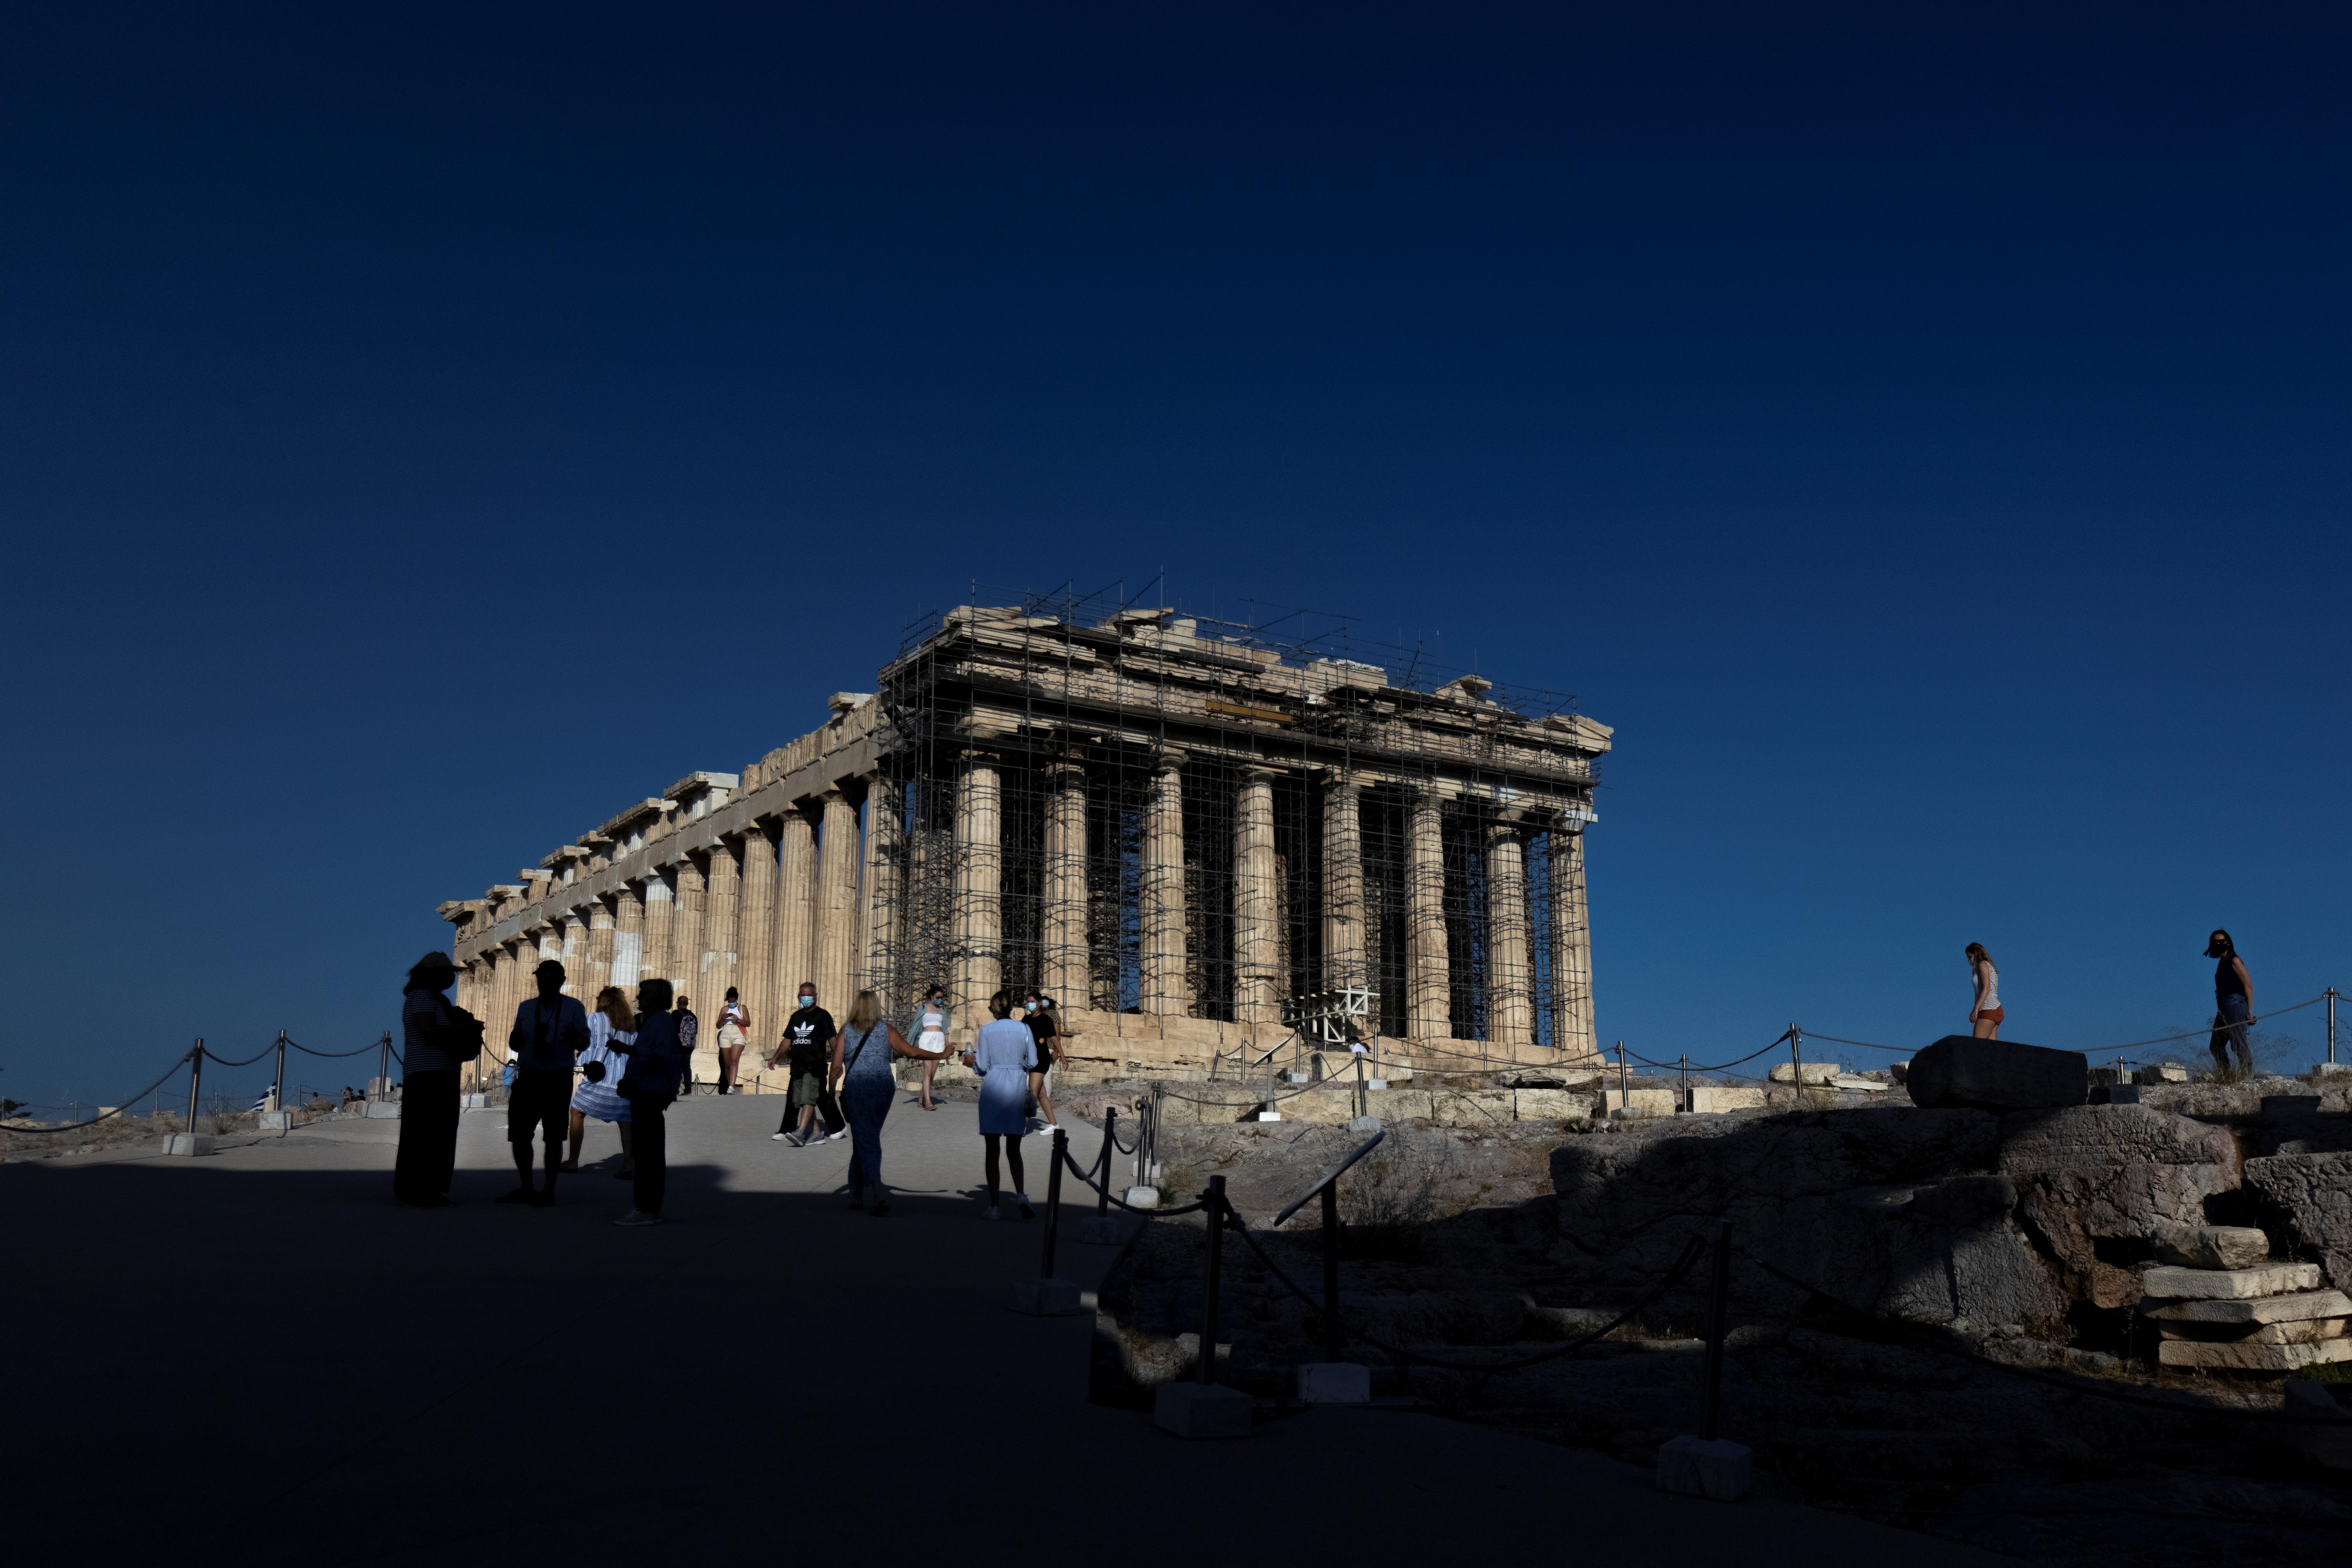 People visit the Parthenon temple atop the Acropolis hill in Athens, Greece, June 8, 2021. REUTERS/Alkis Konstantinidis